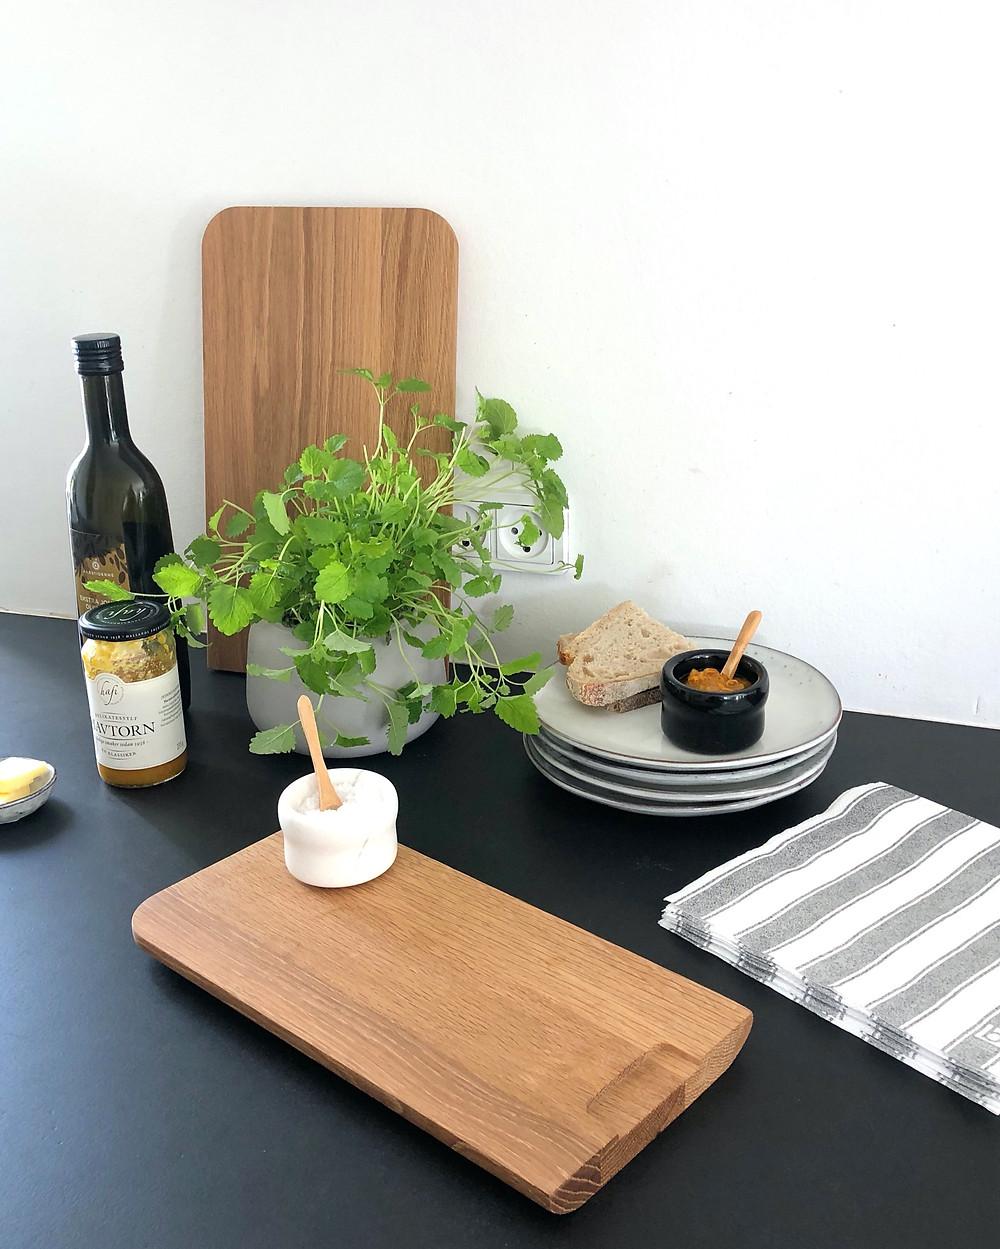 Wood and natural elements, Scandinavian interior